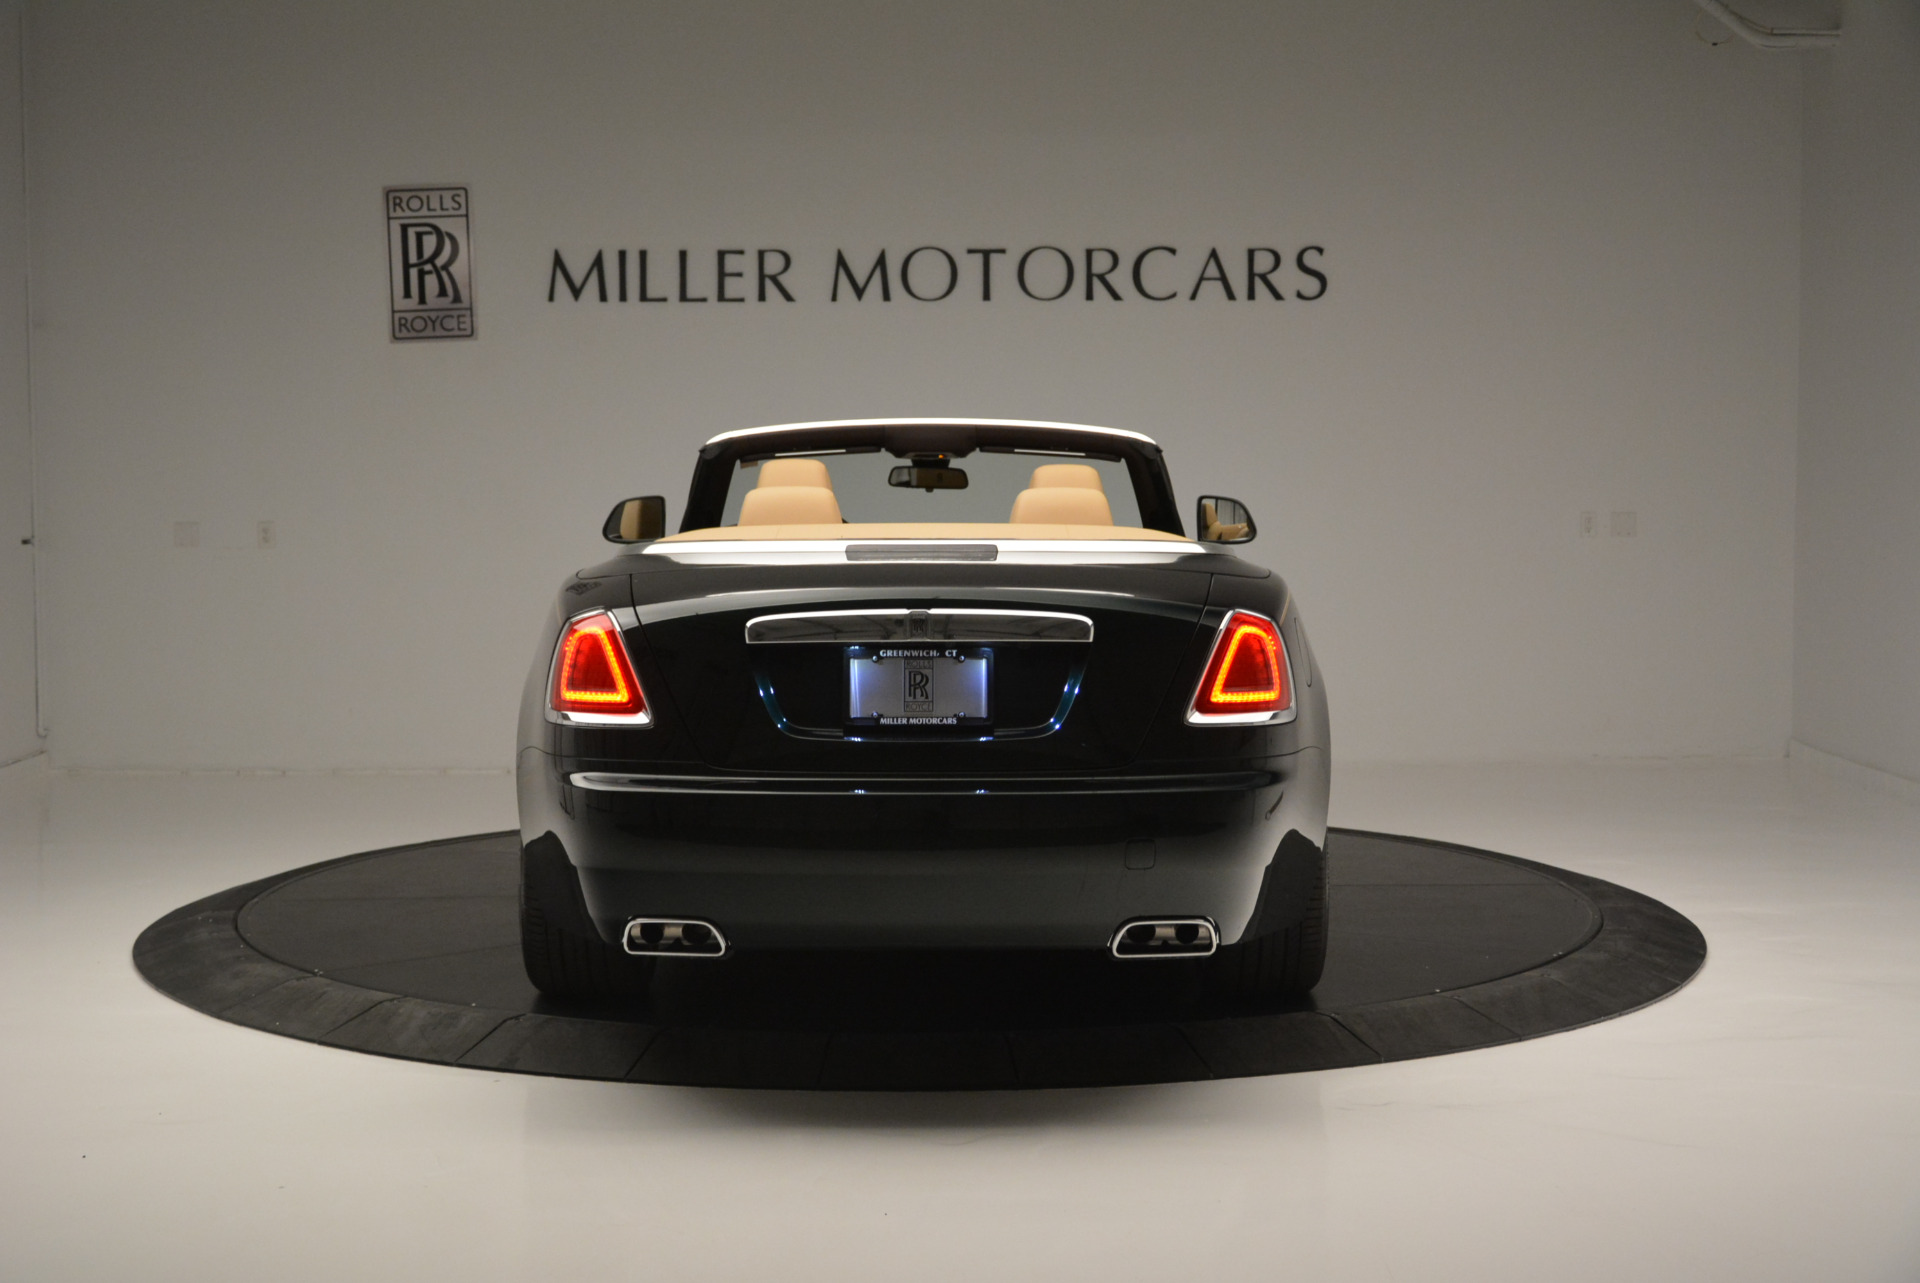 Used 2018 Rolls-Royce Dawn  For Sale In Greenwich, CT. Alfa Romeo of Greenwich, 7445 2179_p4